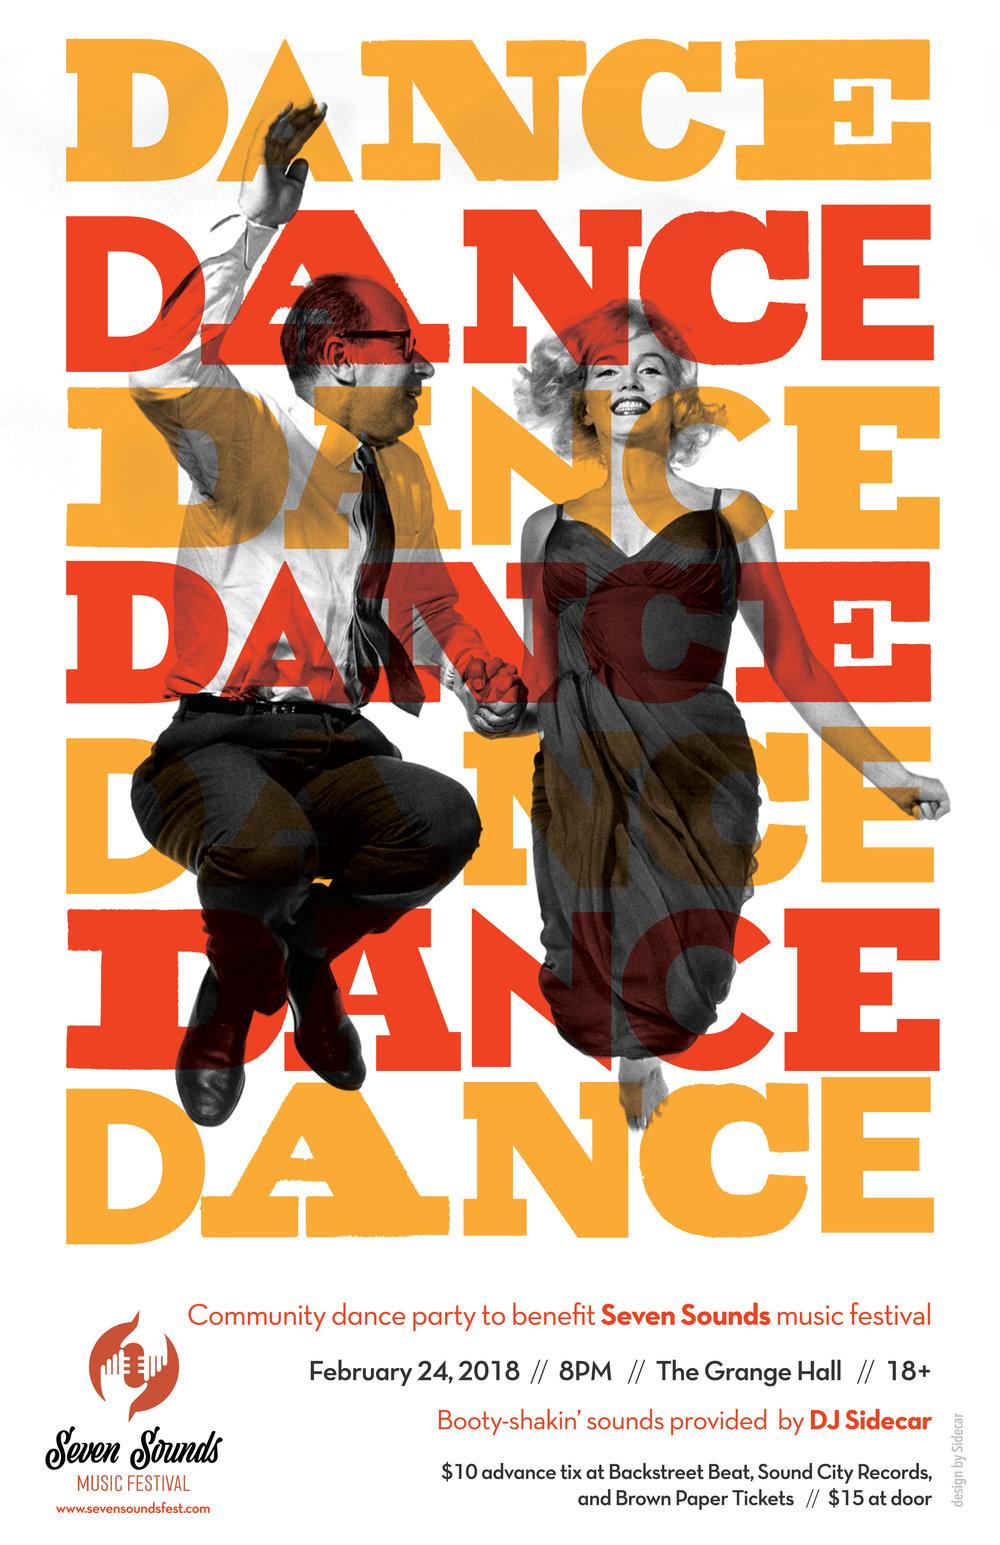 DancePoster2.jpg